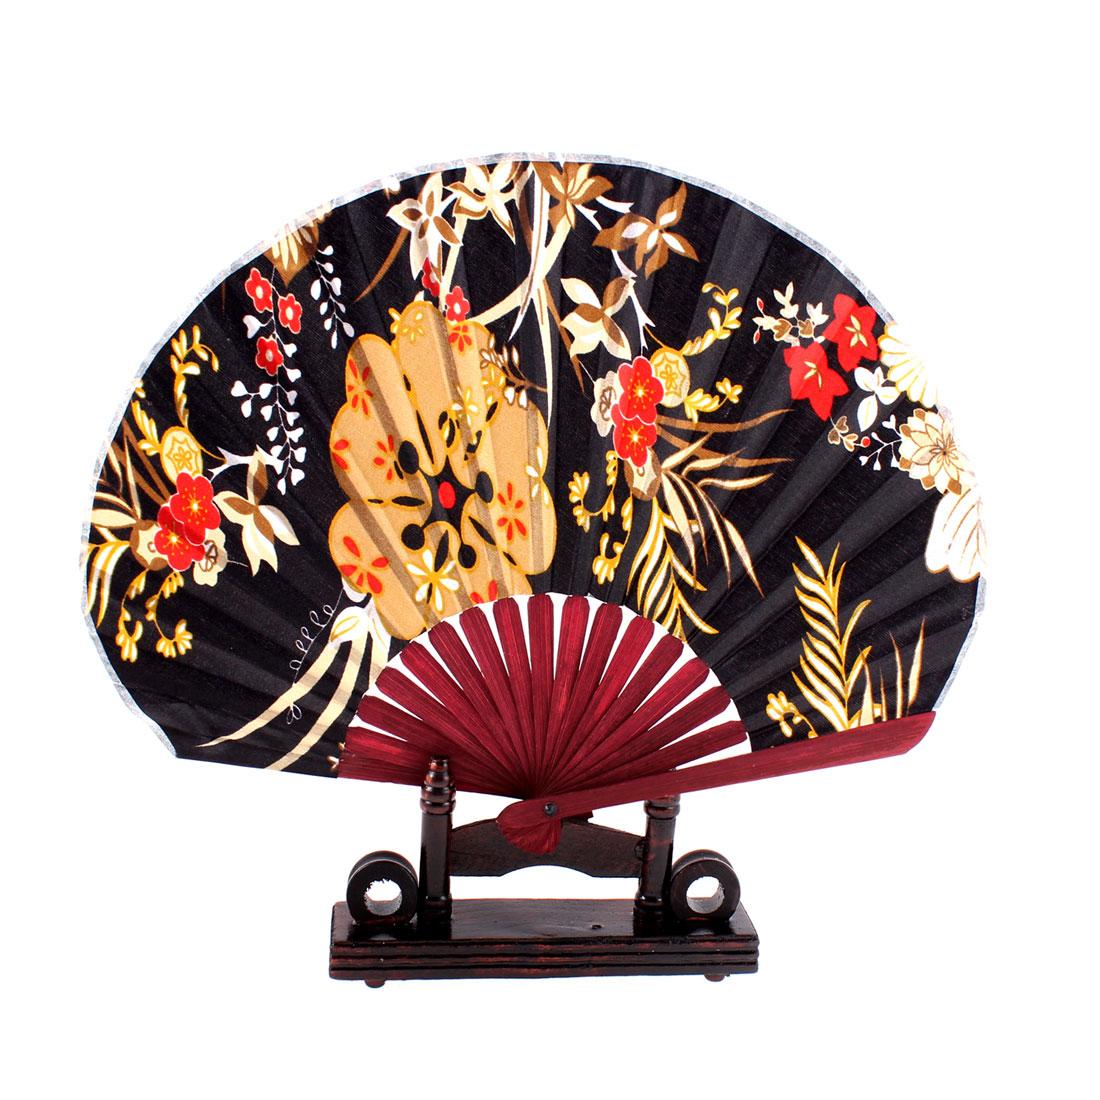 Plum Blossom Design Burgundy Chinese Fabric Folding Hand Fan w Display Holder